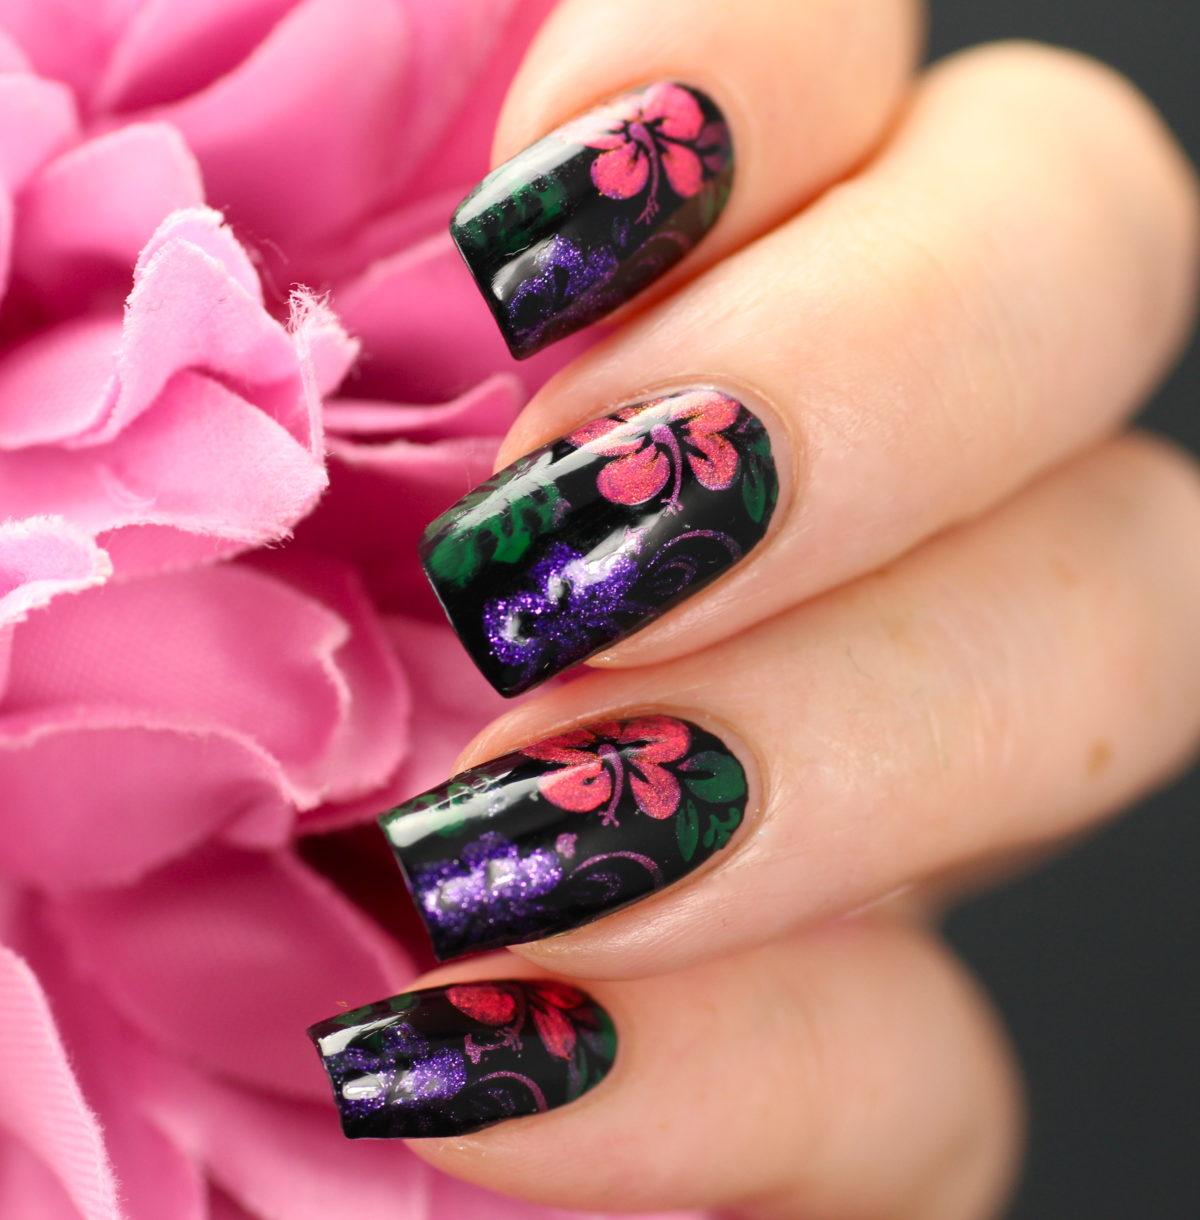 Цветы на черных ногтях фото